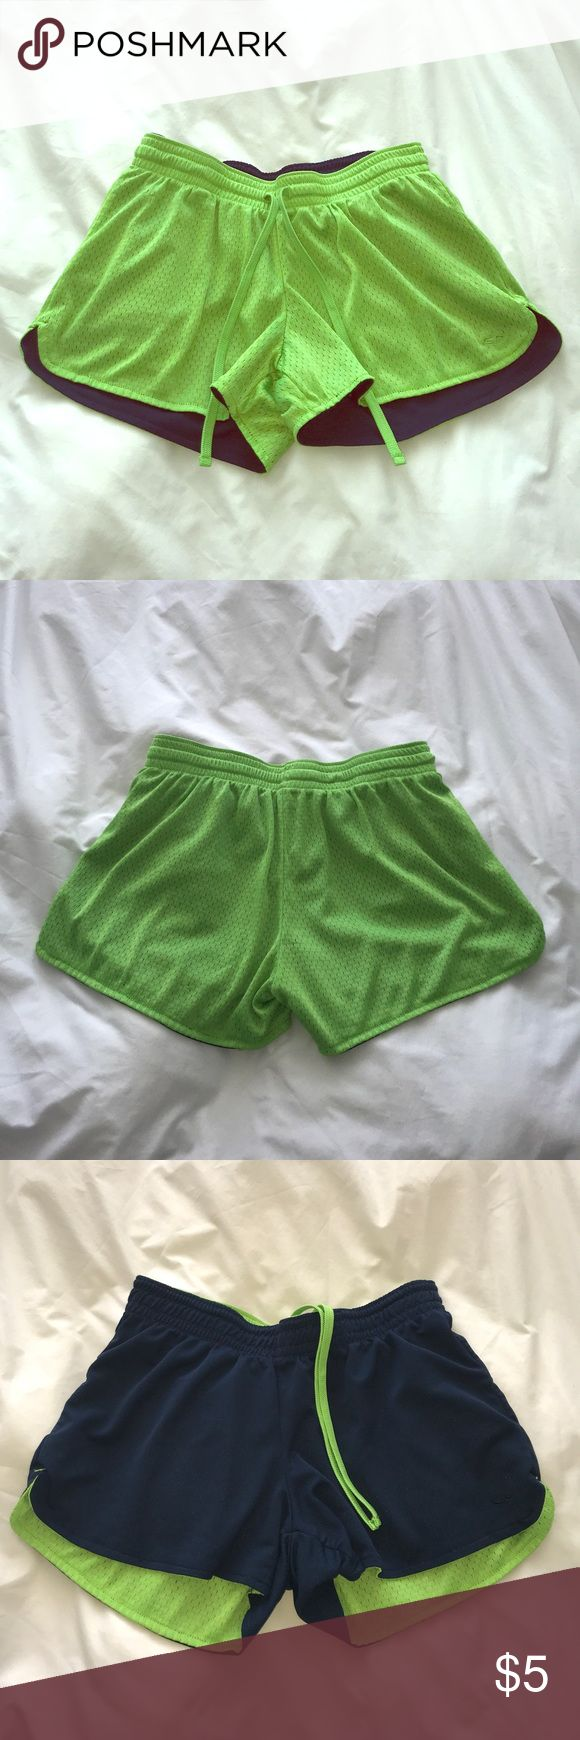 Reversible athletic shorts Neon green / navy blue reversible basketball shorts, good condition Champion Shorts